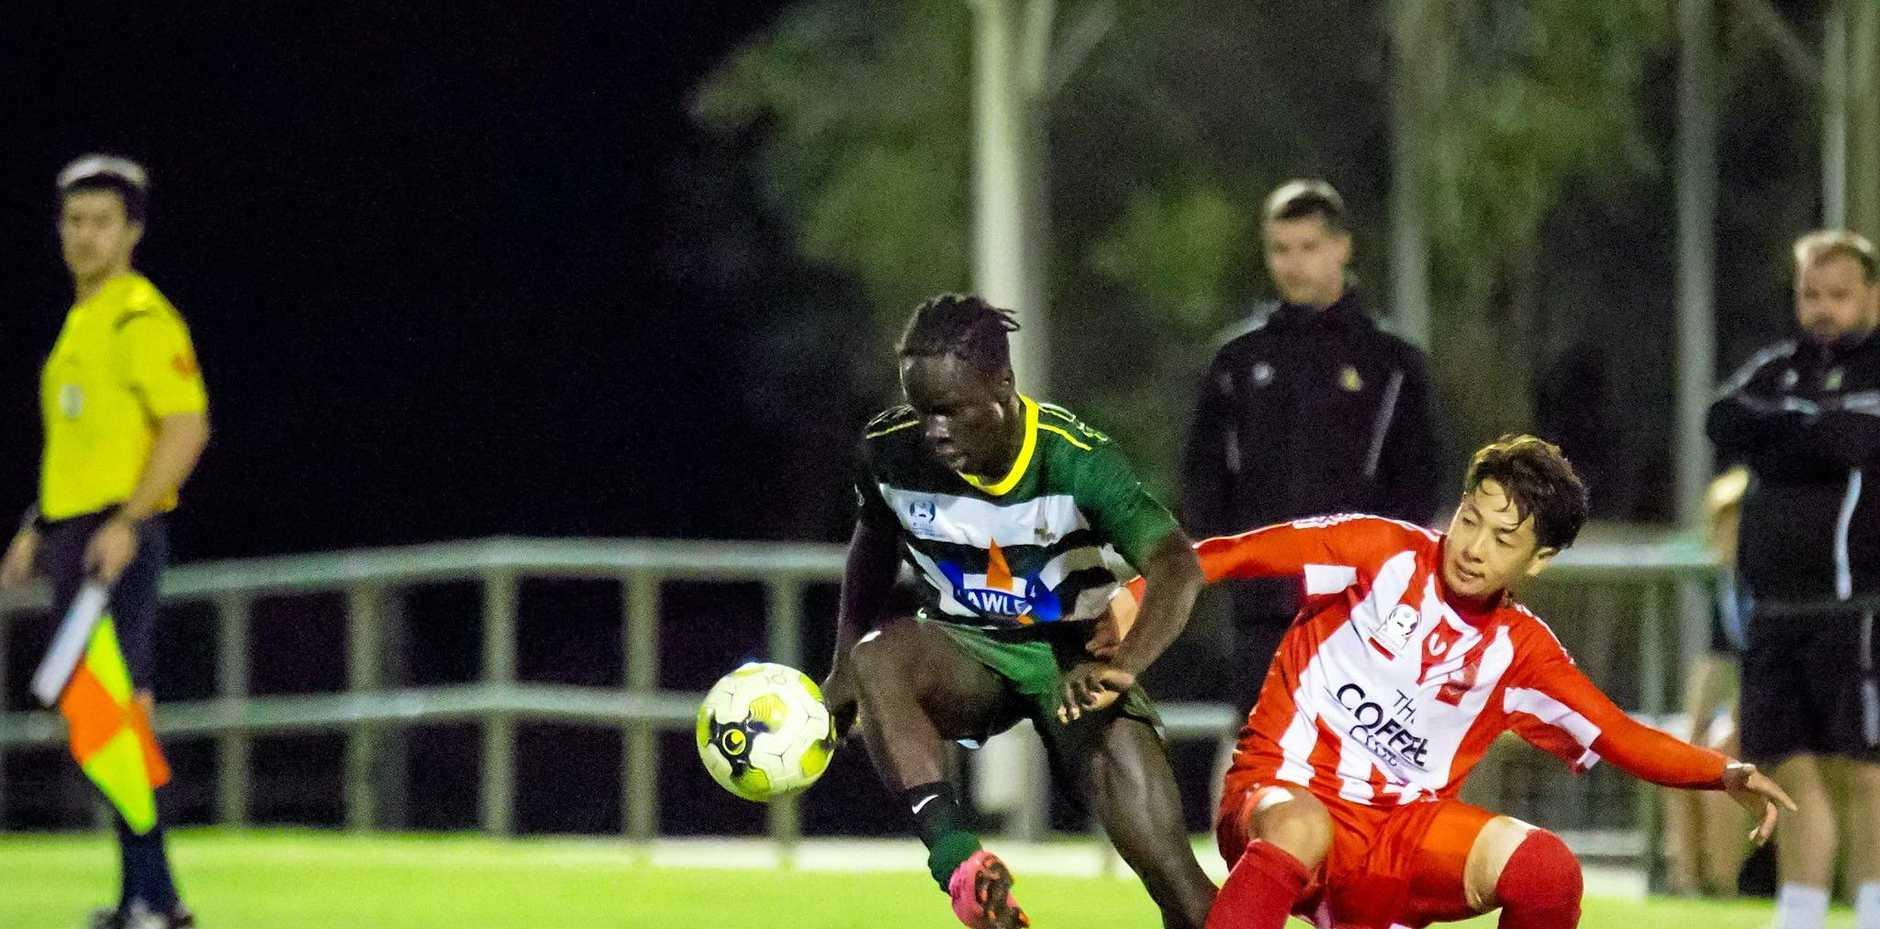 Western Pride footballer Bonventure Thomas-Remijo.